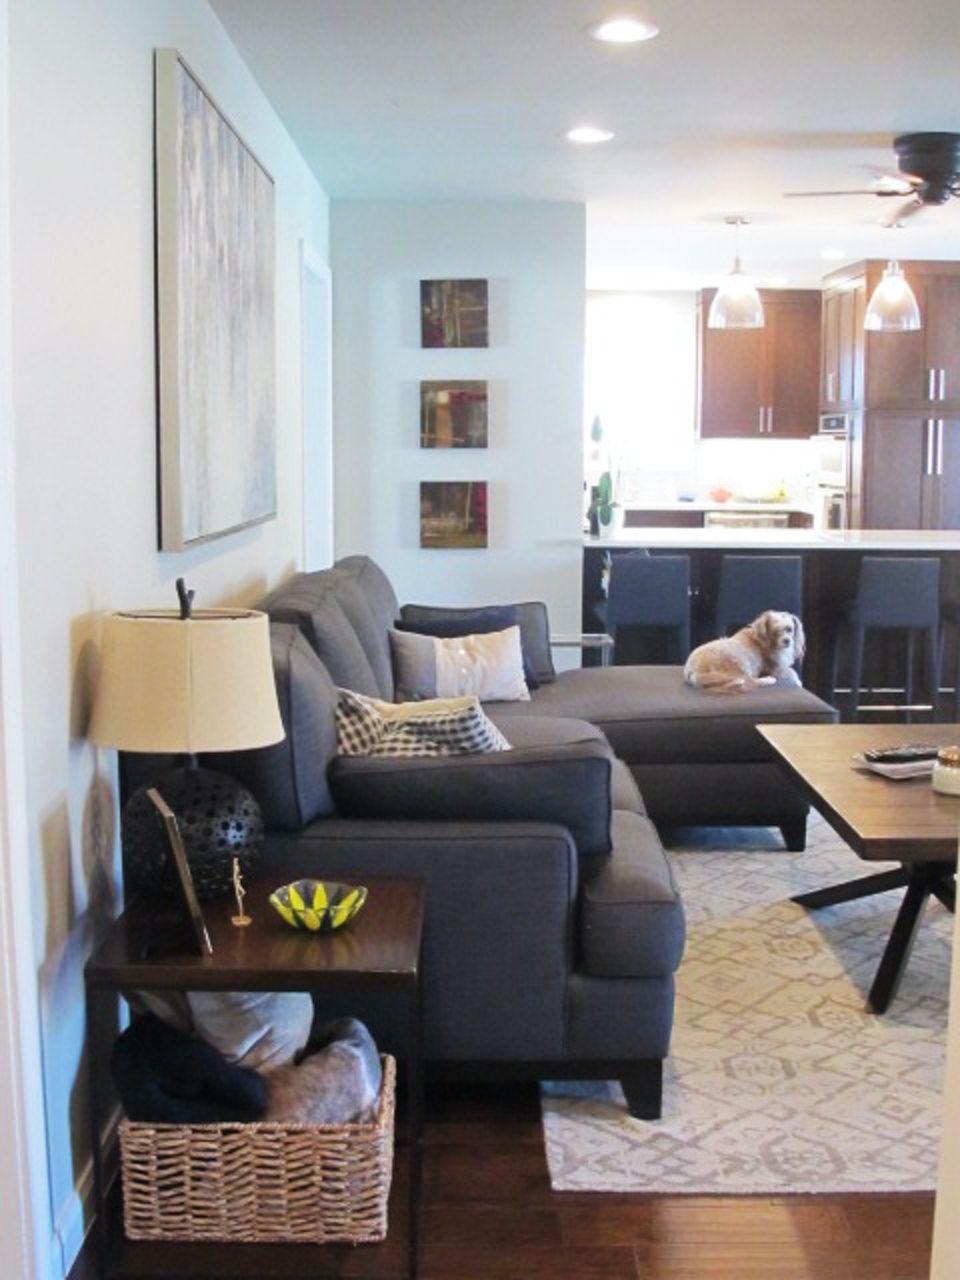 Goodhart Traditional Home Photo Video Location Shoot Houston 10.jpg